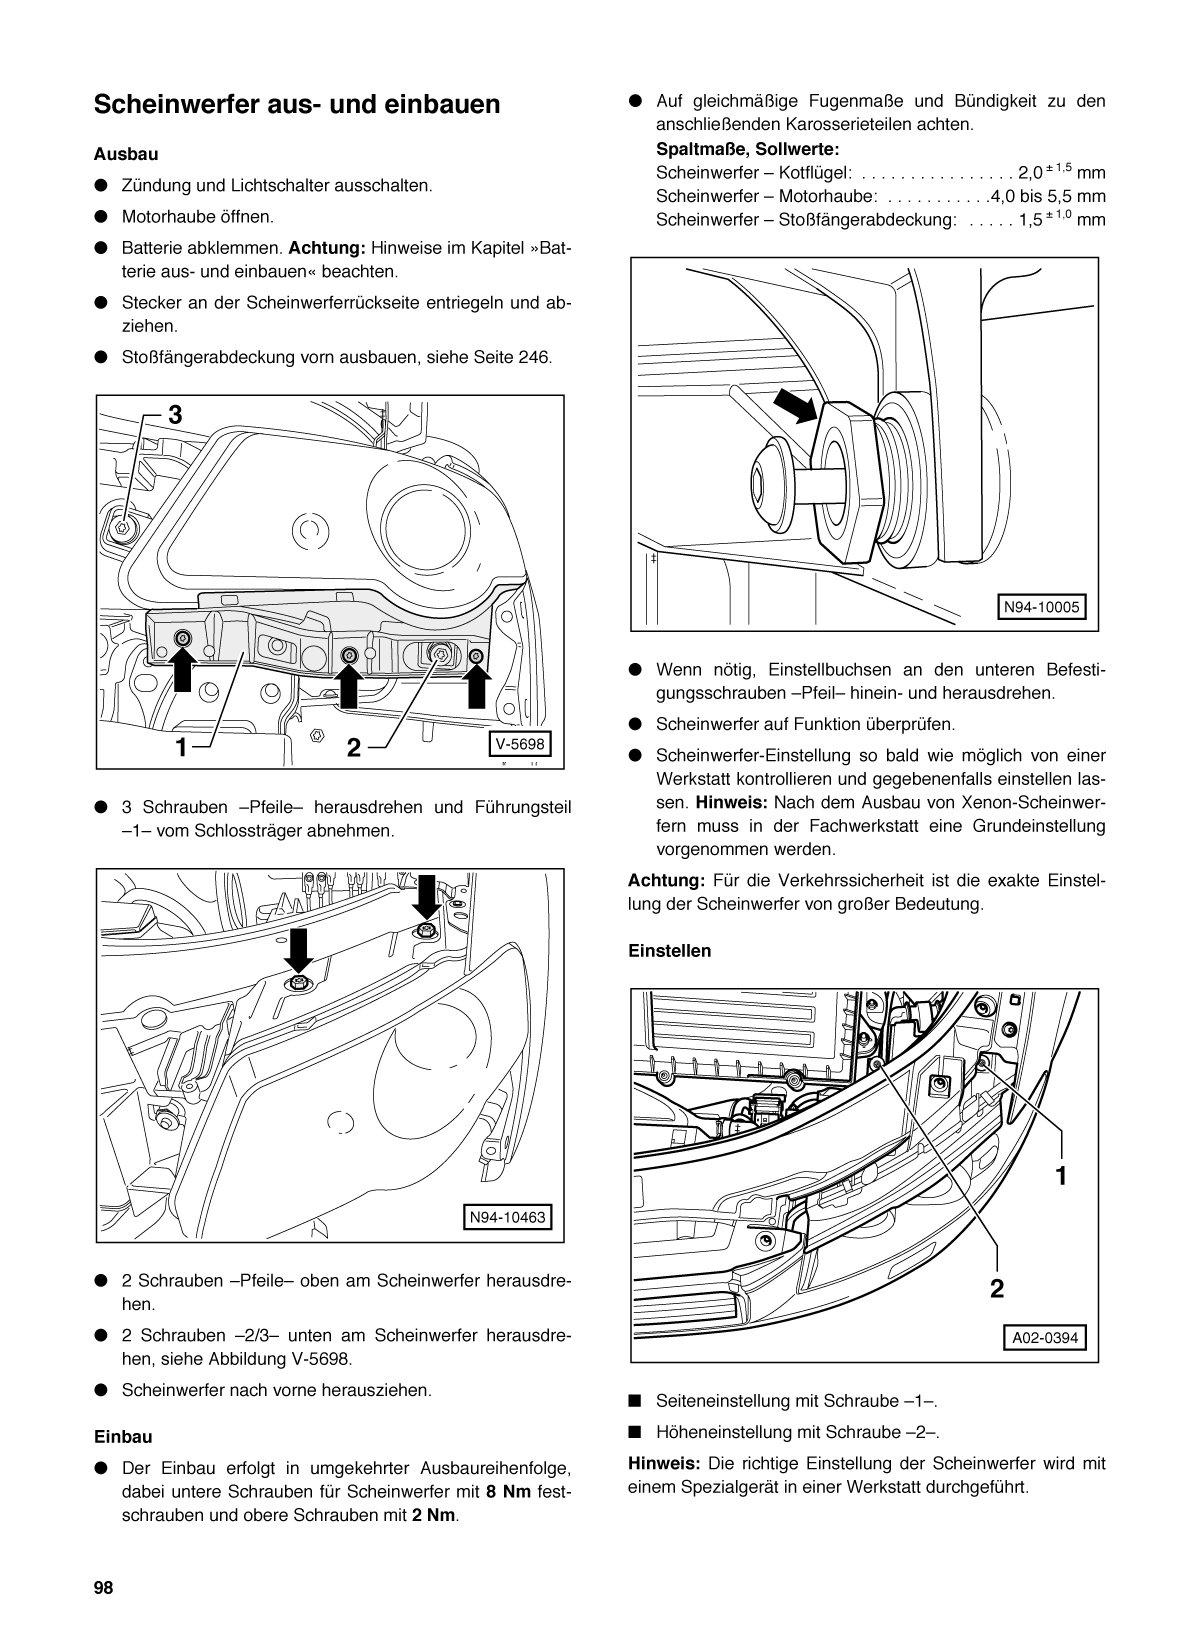 Erfreut Kotflügel Schaltplan Ideen - Schaltplan Serie Circuit ...